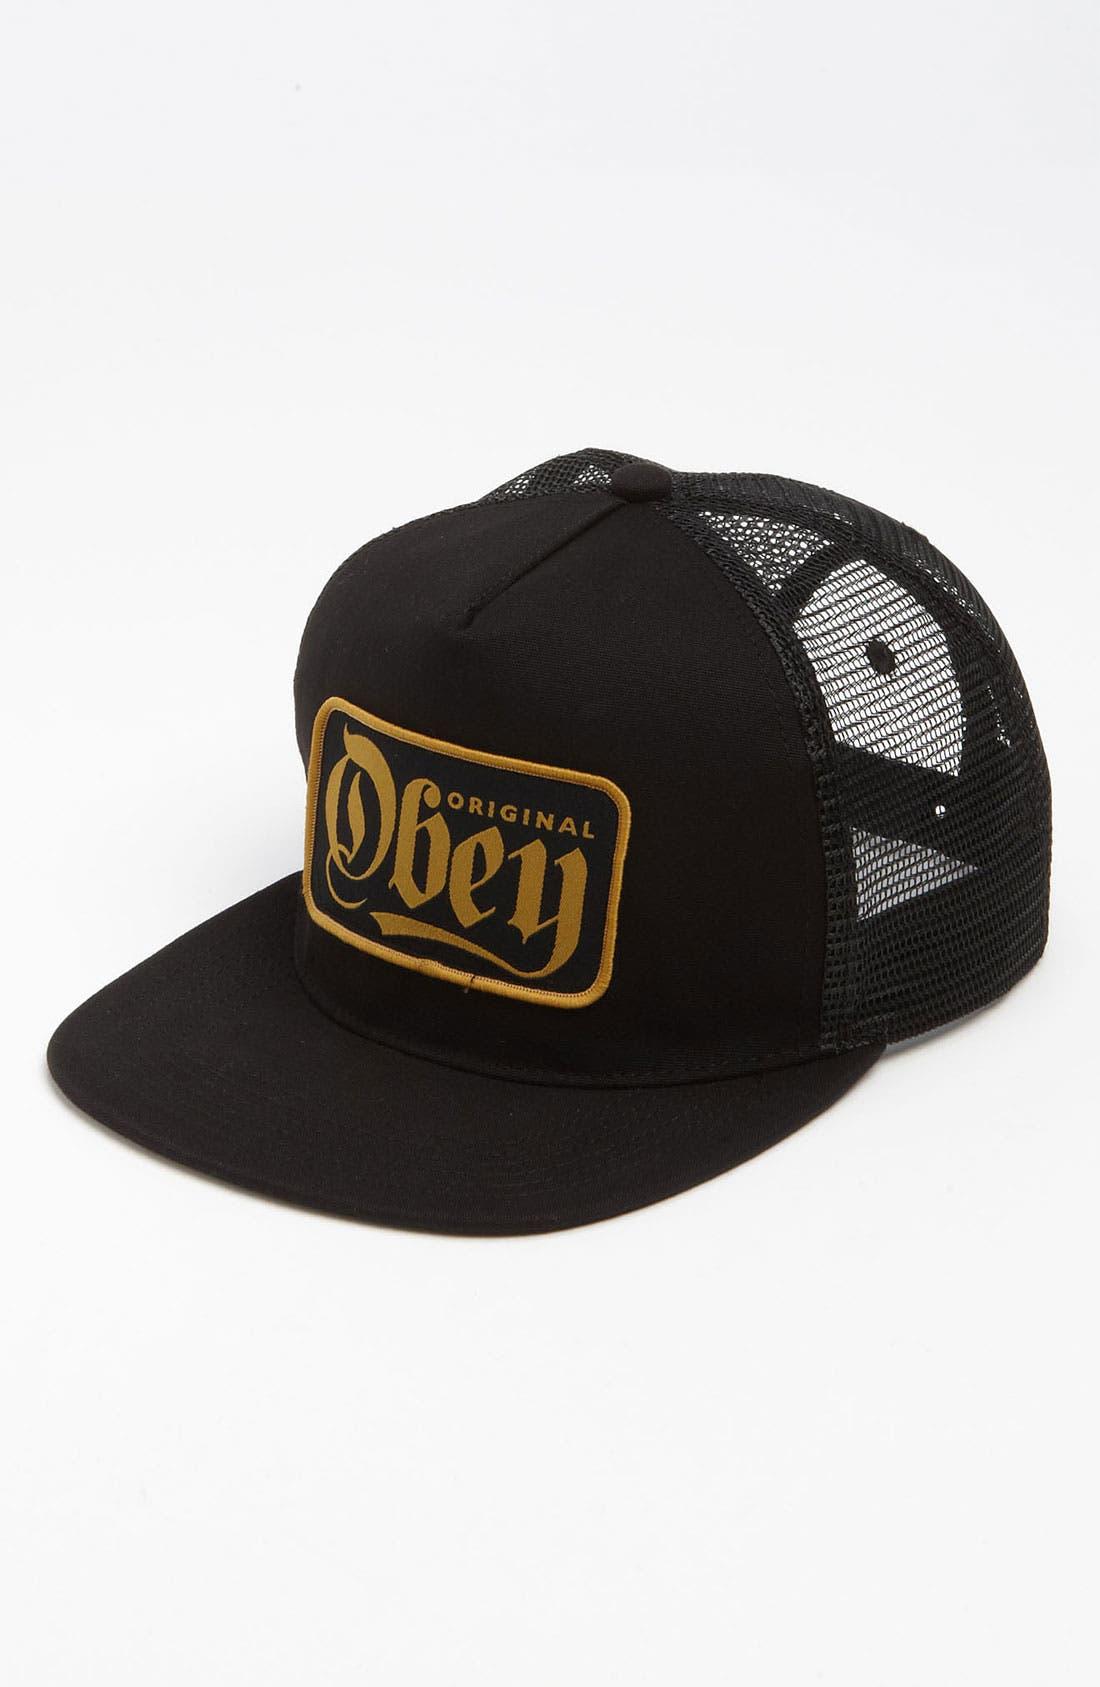 Alternate Image 1 Selected - Obey 'Stout' Snapback Trucker Hat